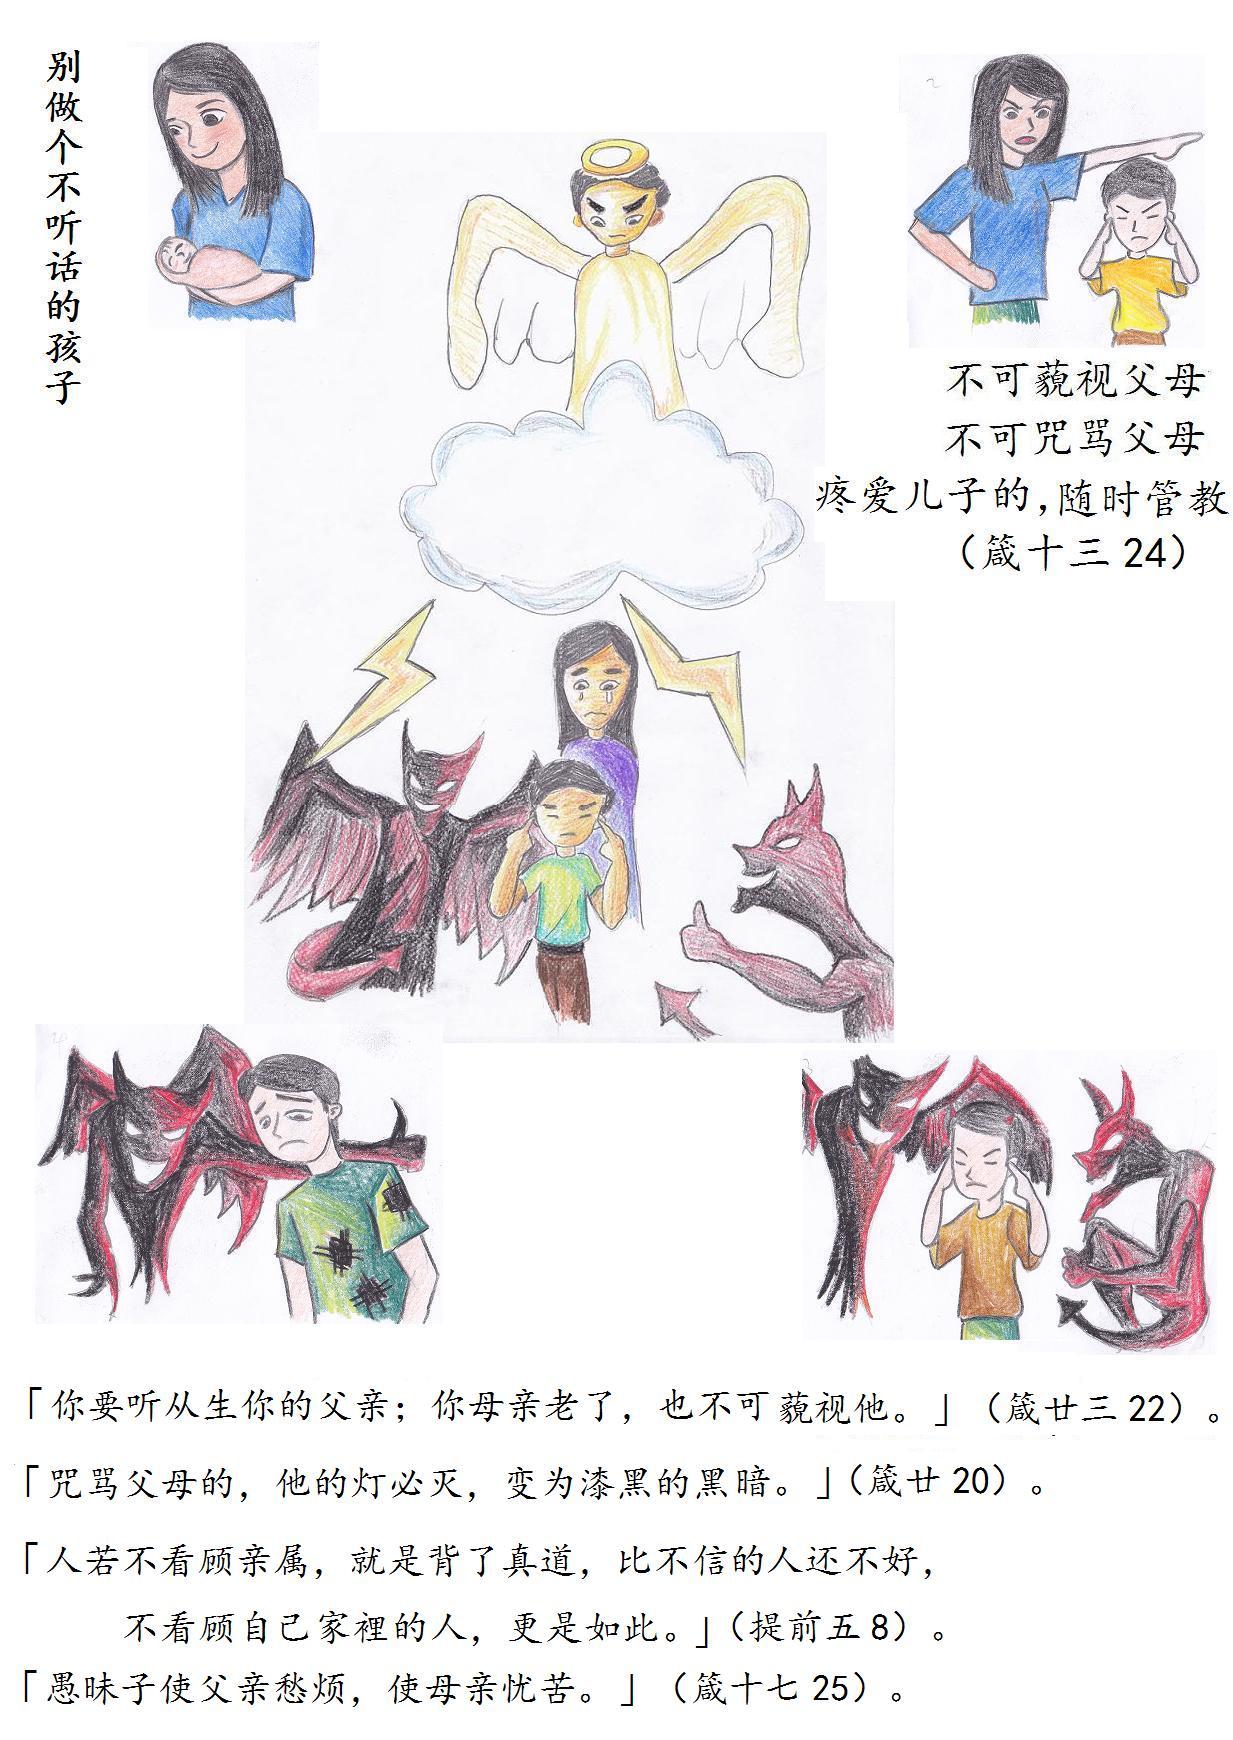 14 漫画  孝敬父母2 Final